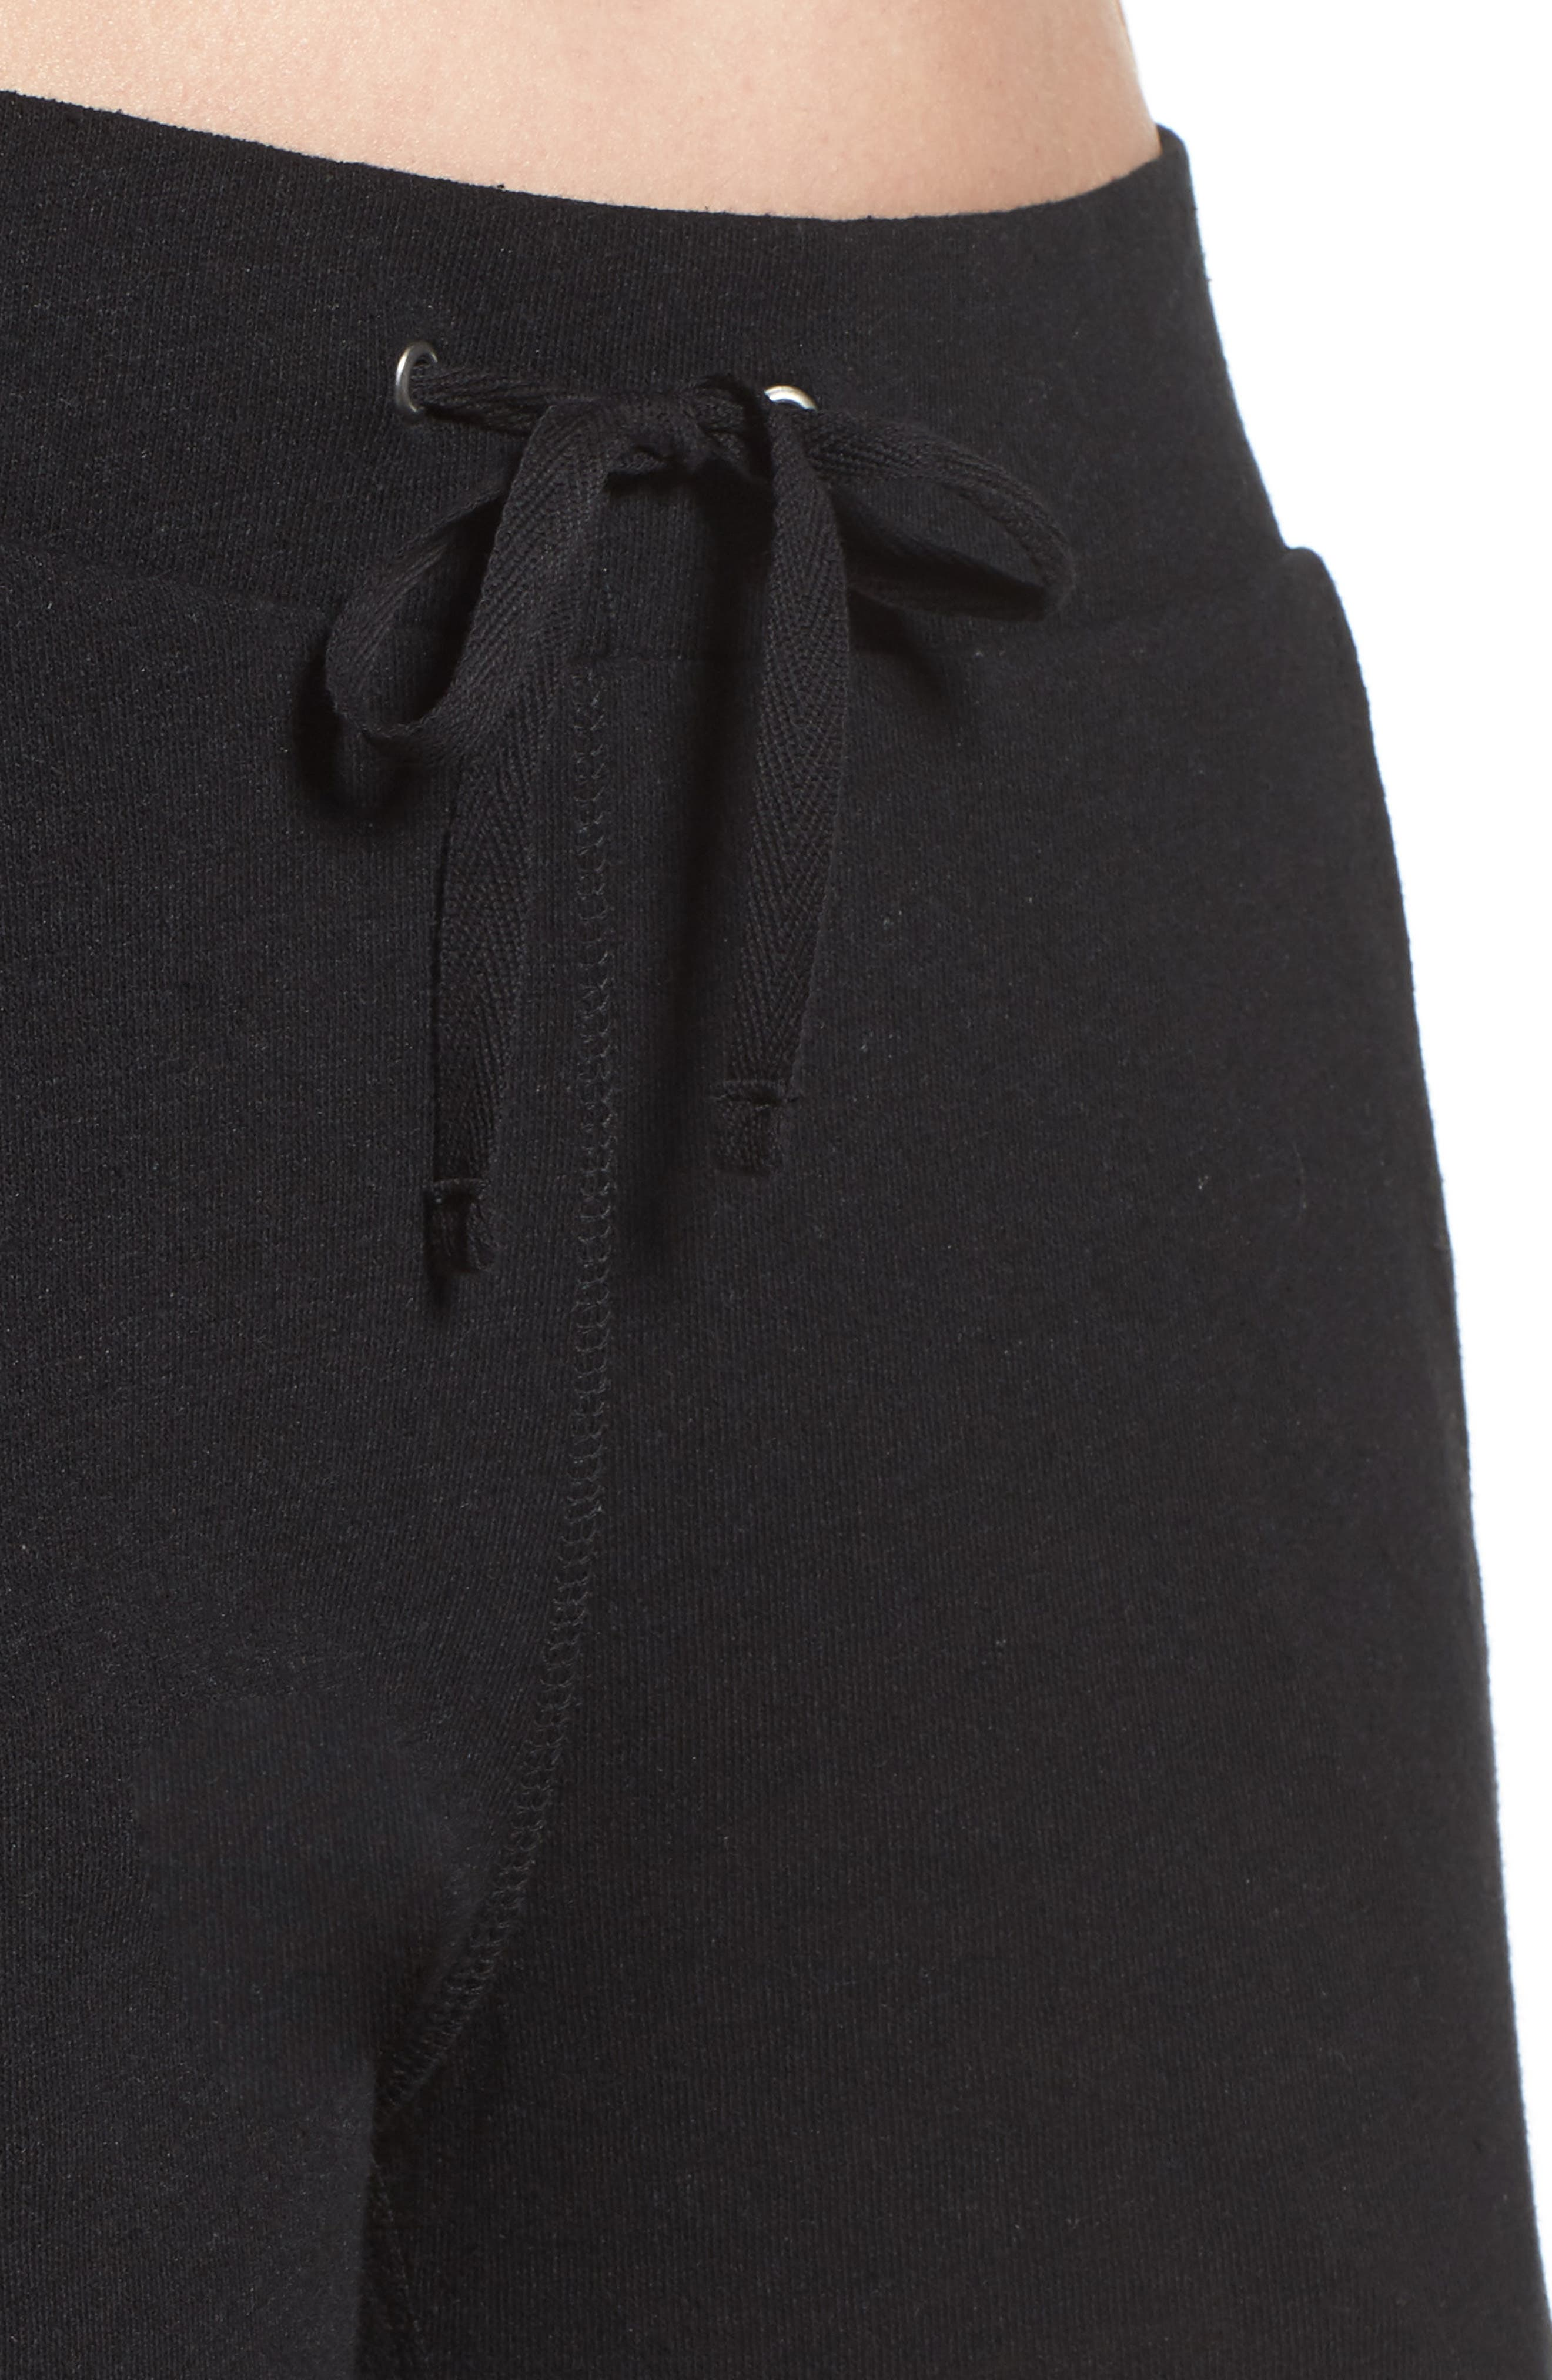 Clementine Cotton & Silk Pajama Pants,                             Alternate thumbnail 6, color,                             Black